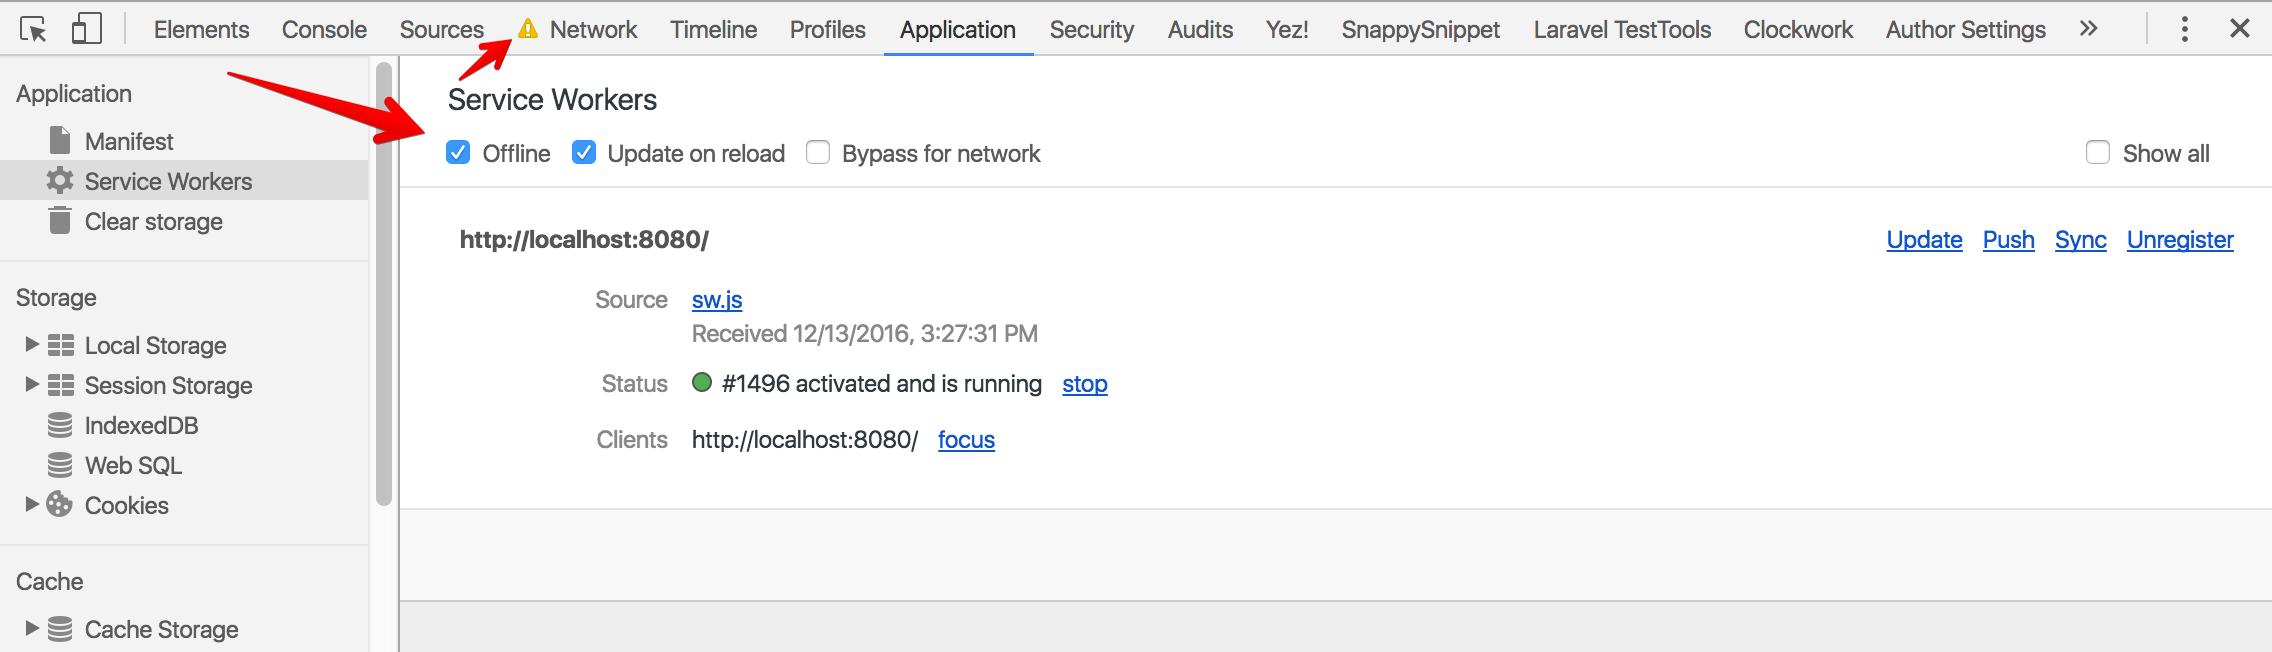 Offline-Network Tab